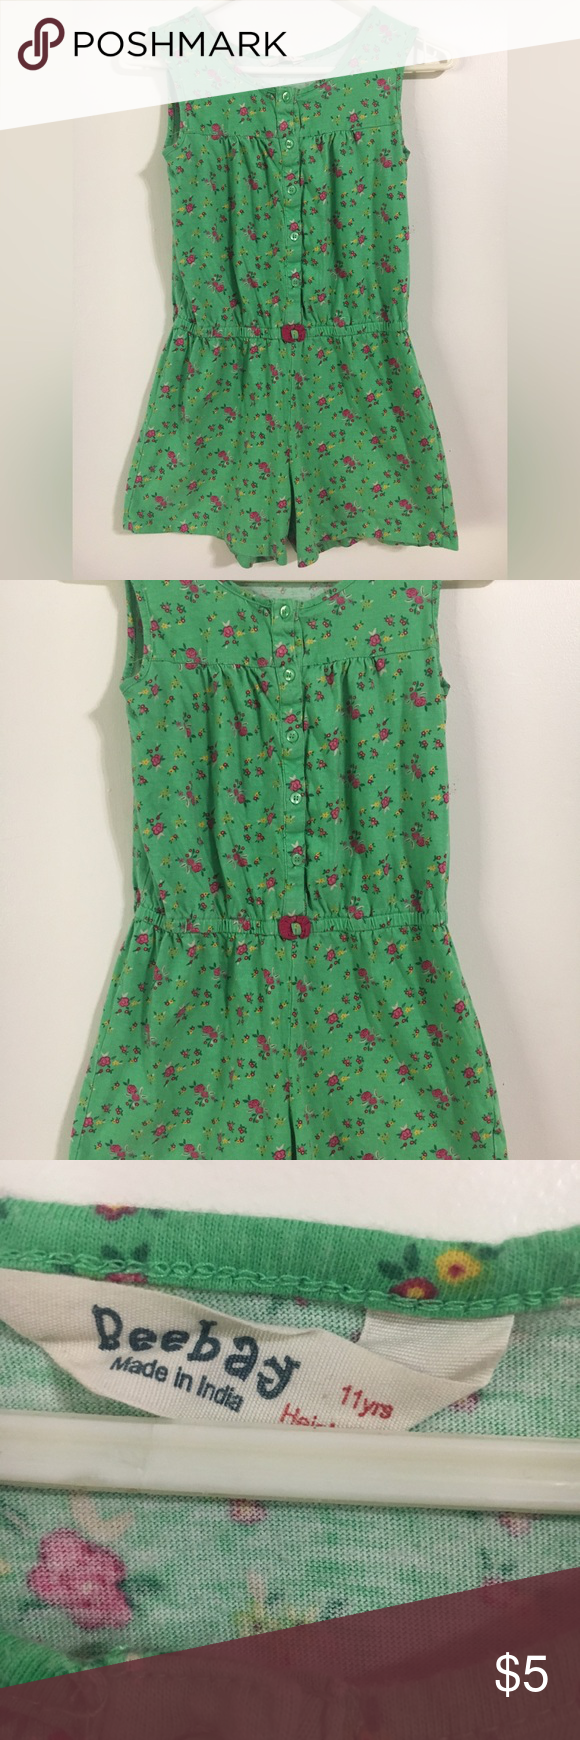 Girls Romper Green with Floral Print Beebay brand Girls